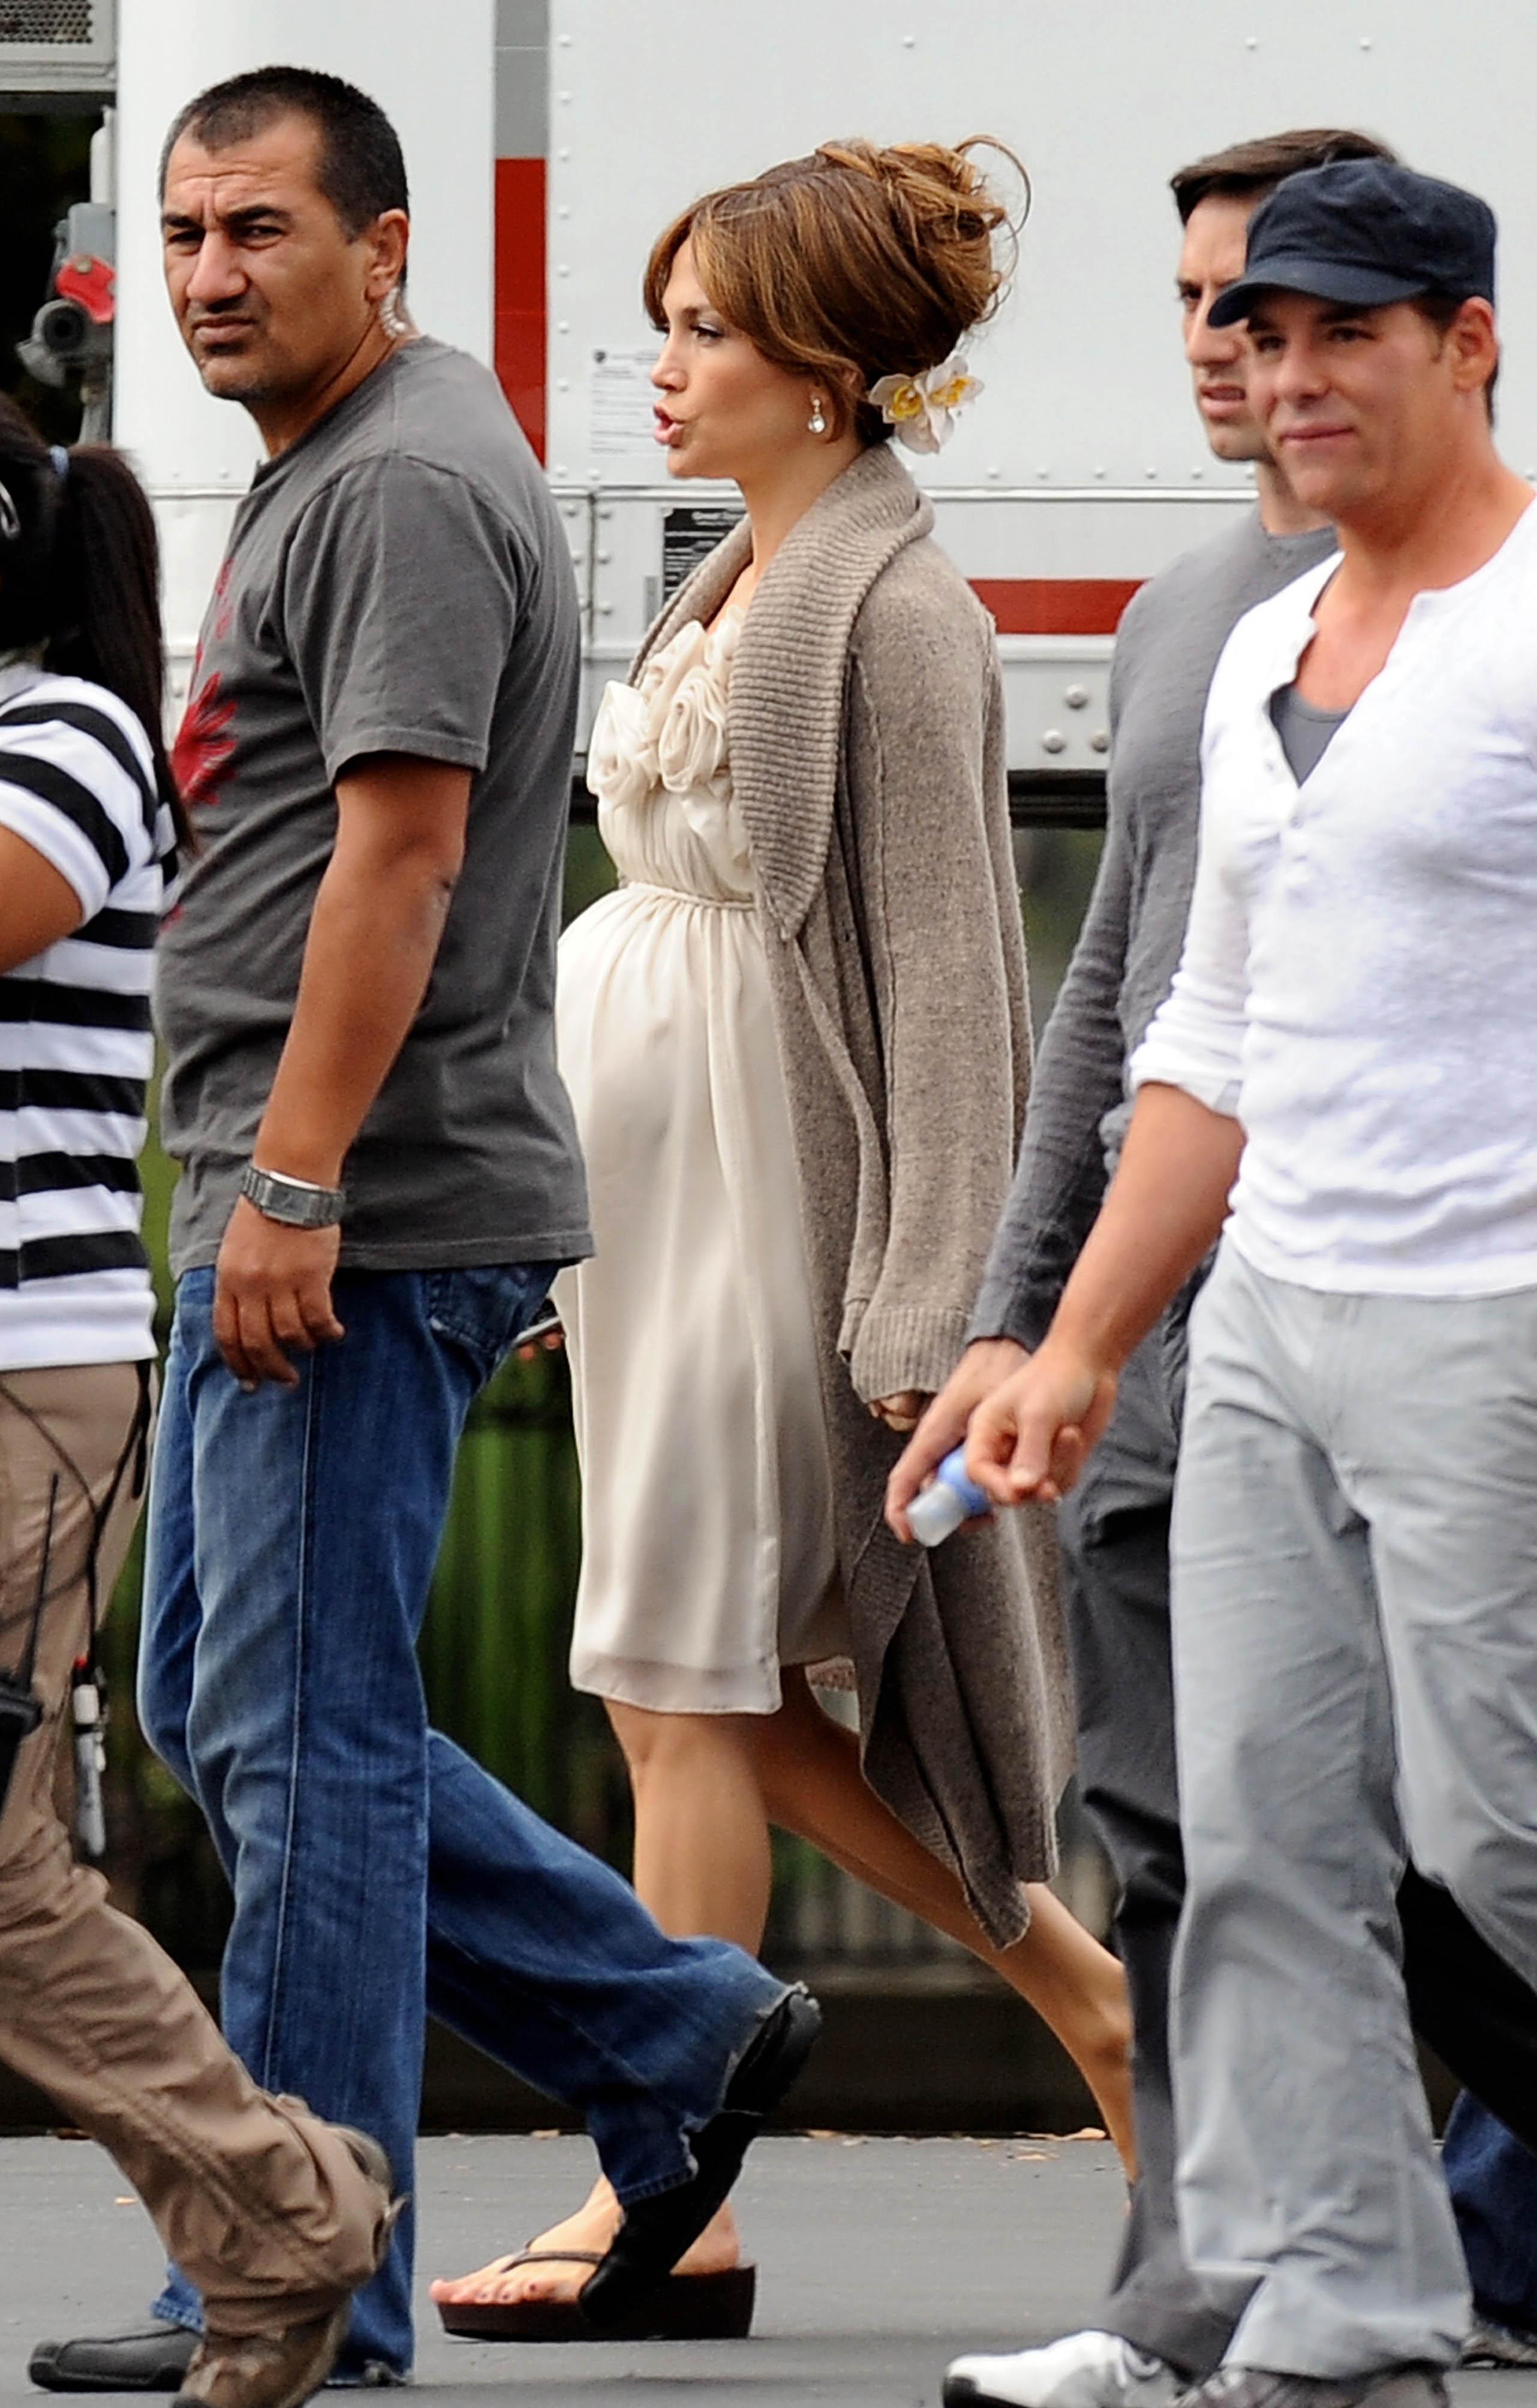 28056_Preppie_-_Jennifer_Lopez_on_The_Back-Up_Plan_set_in_L.A._-_June_15_2009_333_122_355lo.jpg